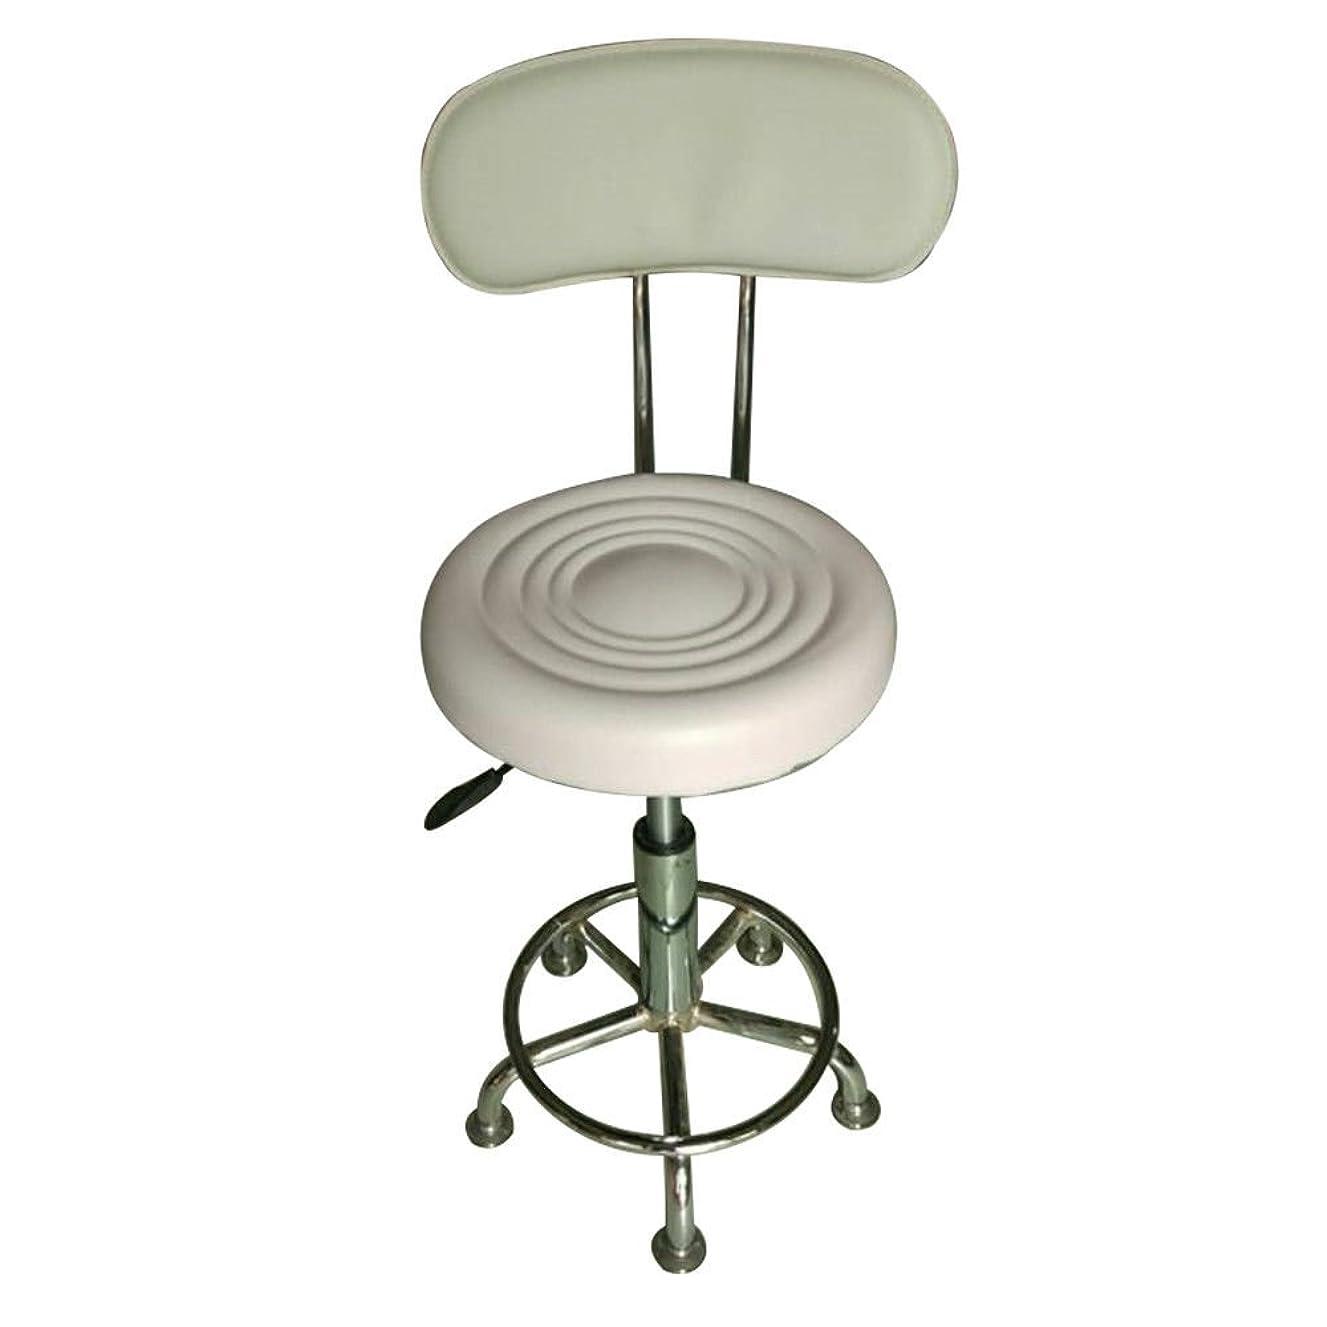 Work Shop Stool Bench Mechanics Chair Garage Adjustable Height Seat